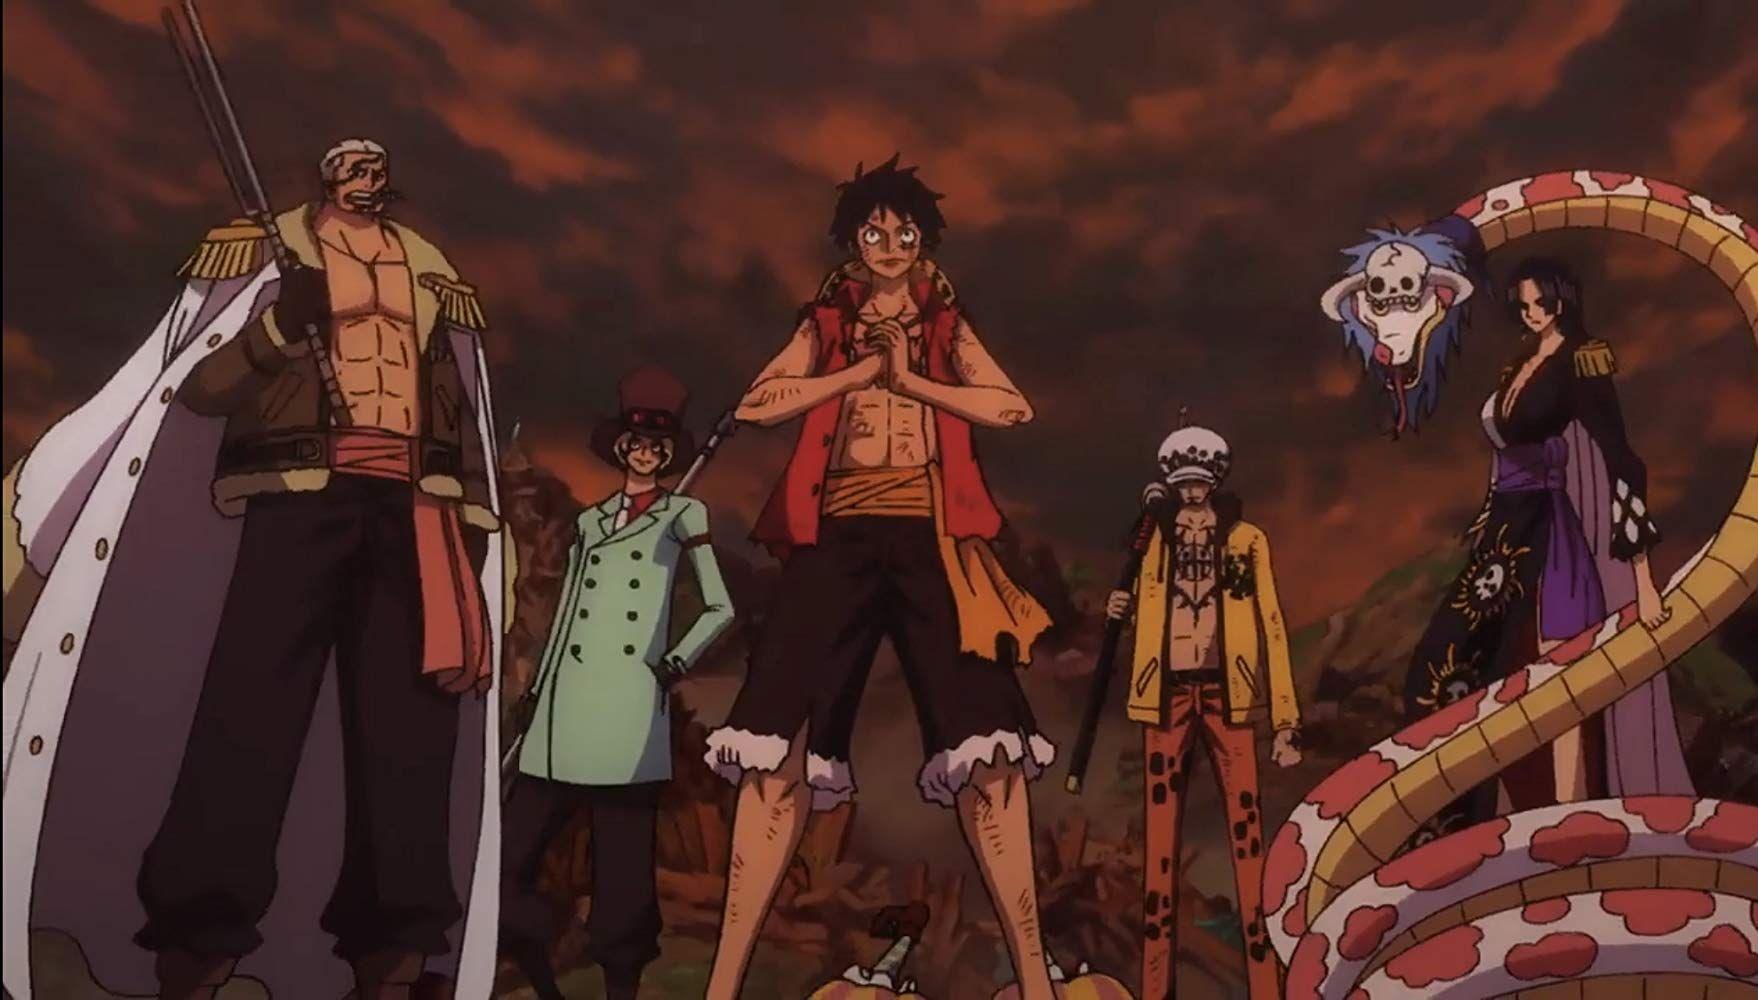 Voir One Piece Stampede Film Complet En Francais Gratuit Film Complet En Francais Films Complets Luffy